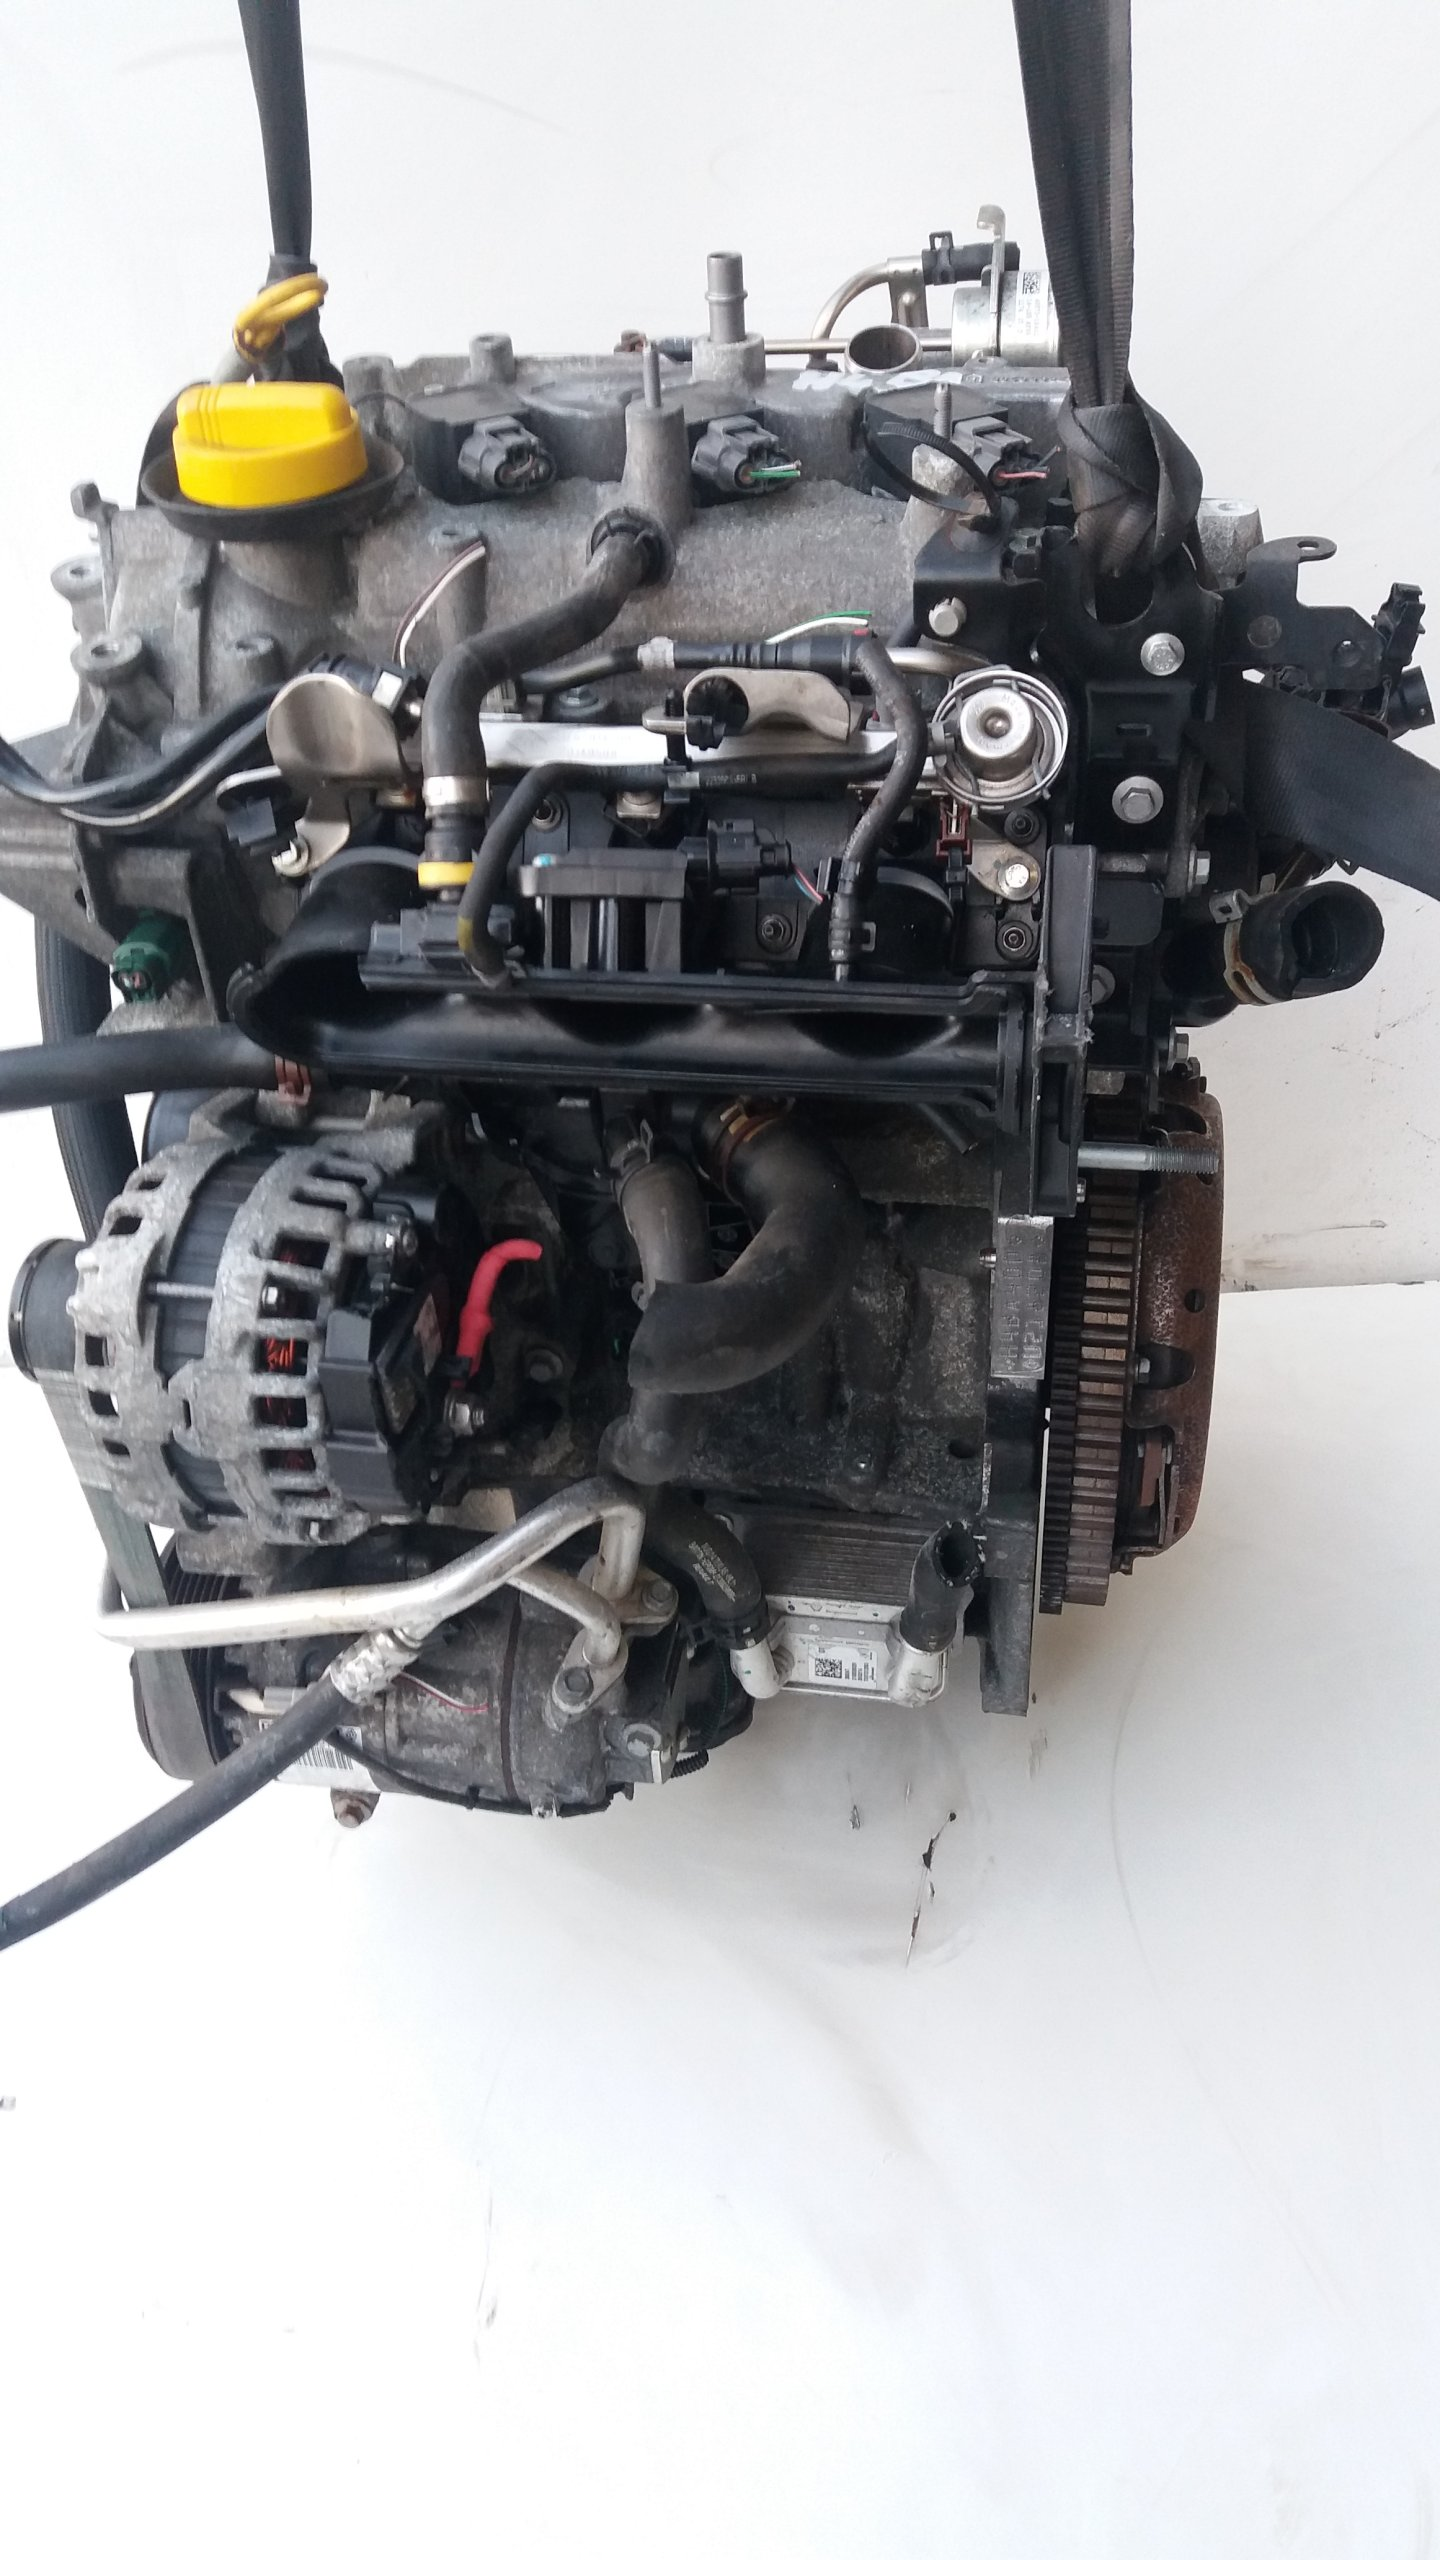 Motor 0,9 TCe H4BA400 na Renault Clio Capture Twingo Dacia Sandero